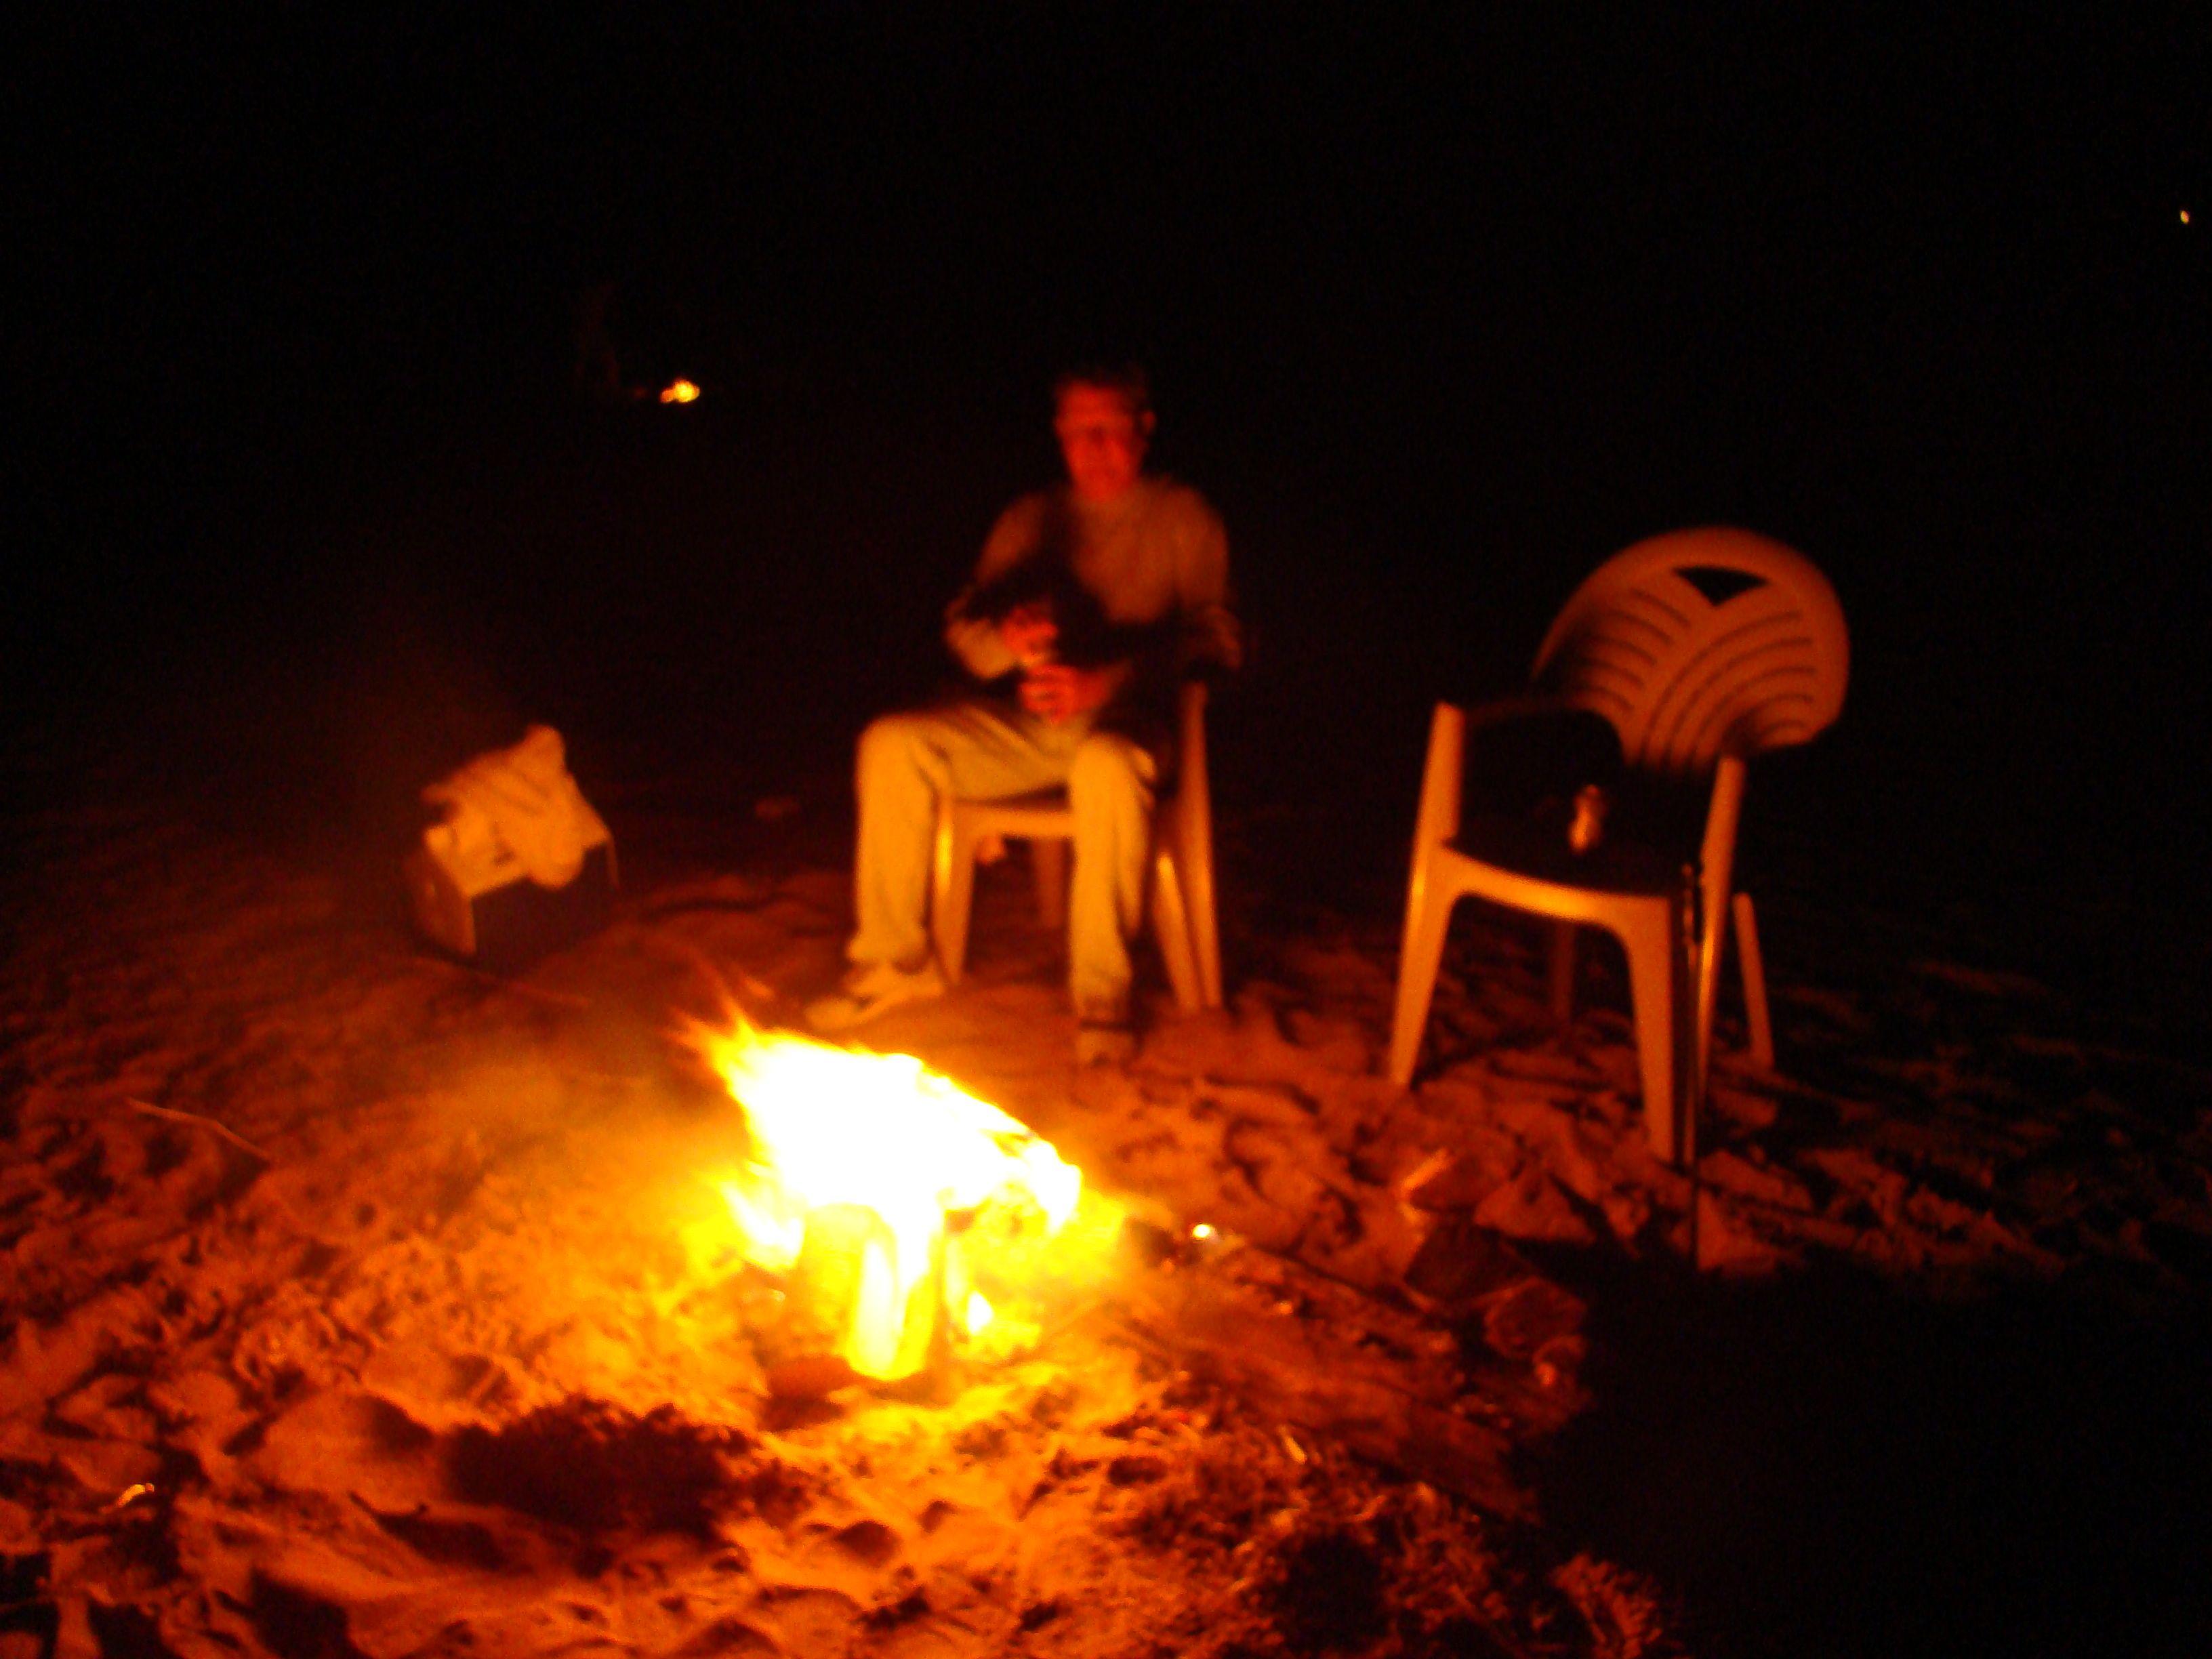 REFINERS FIRE – Brian Doerksen